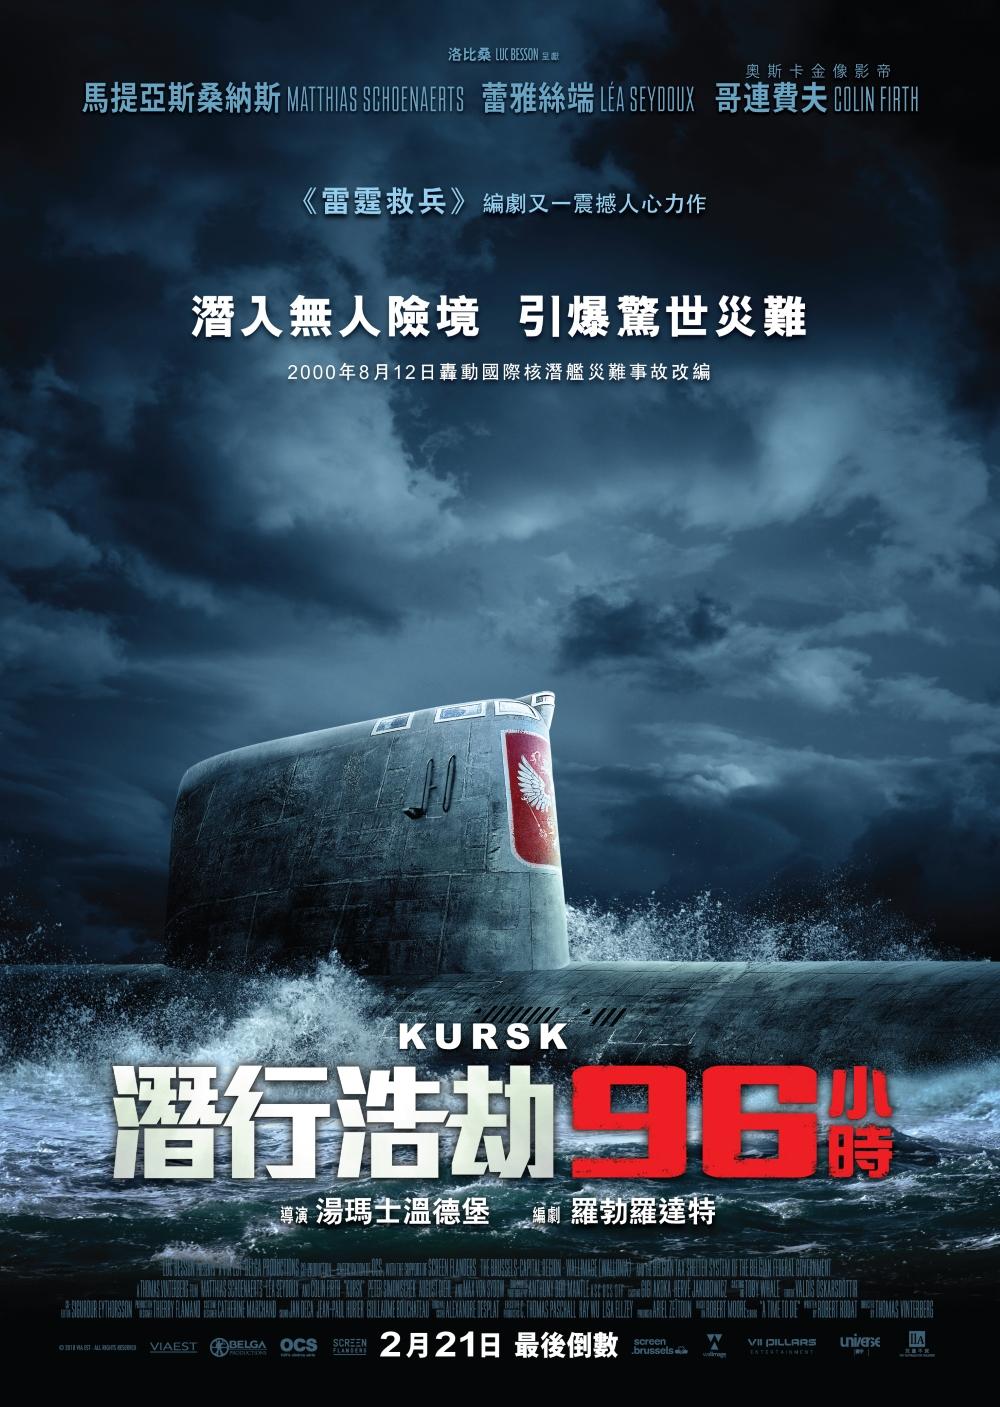 Kursk | Teaser Trailer